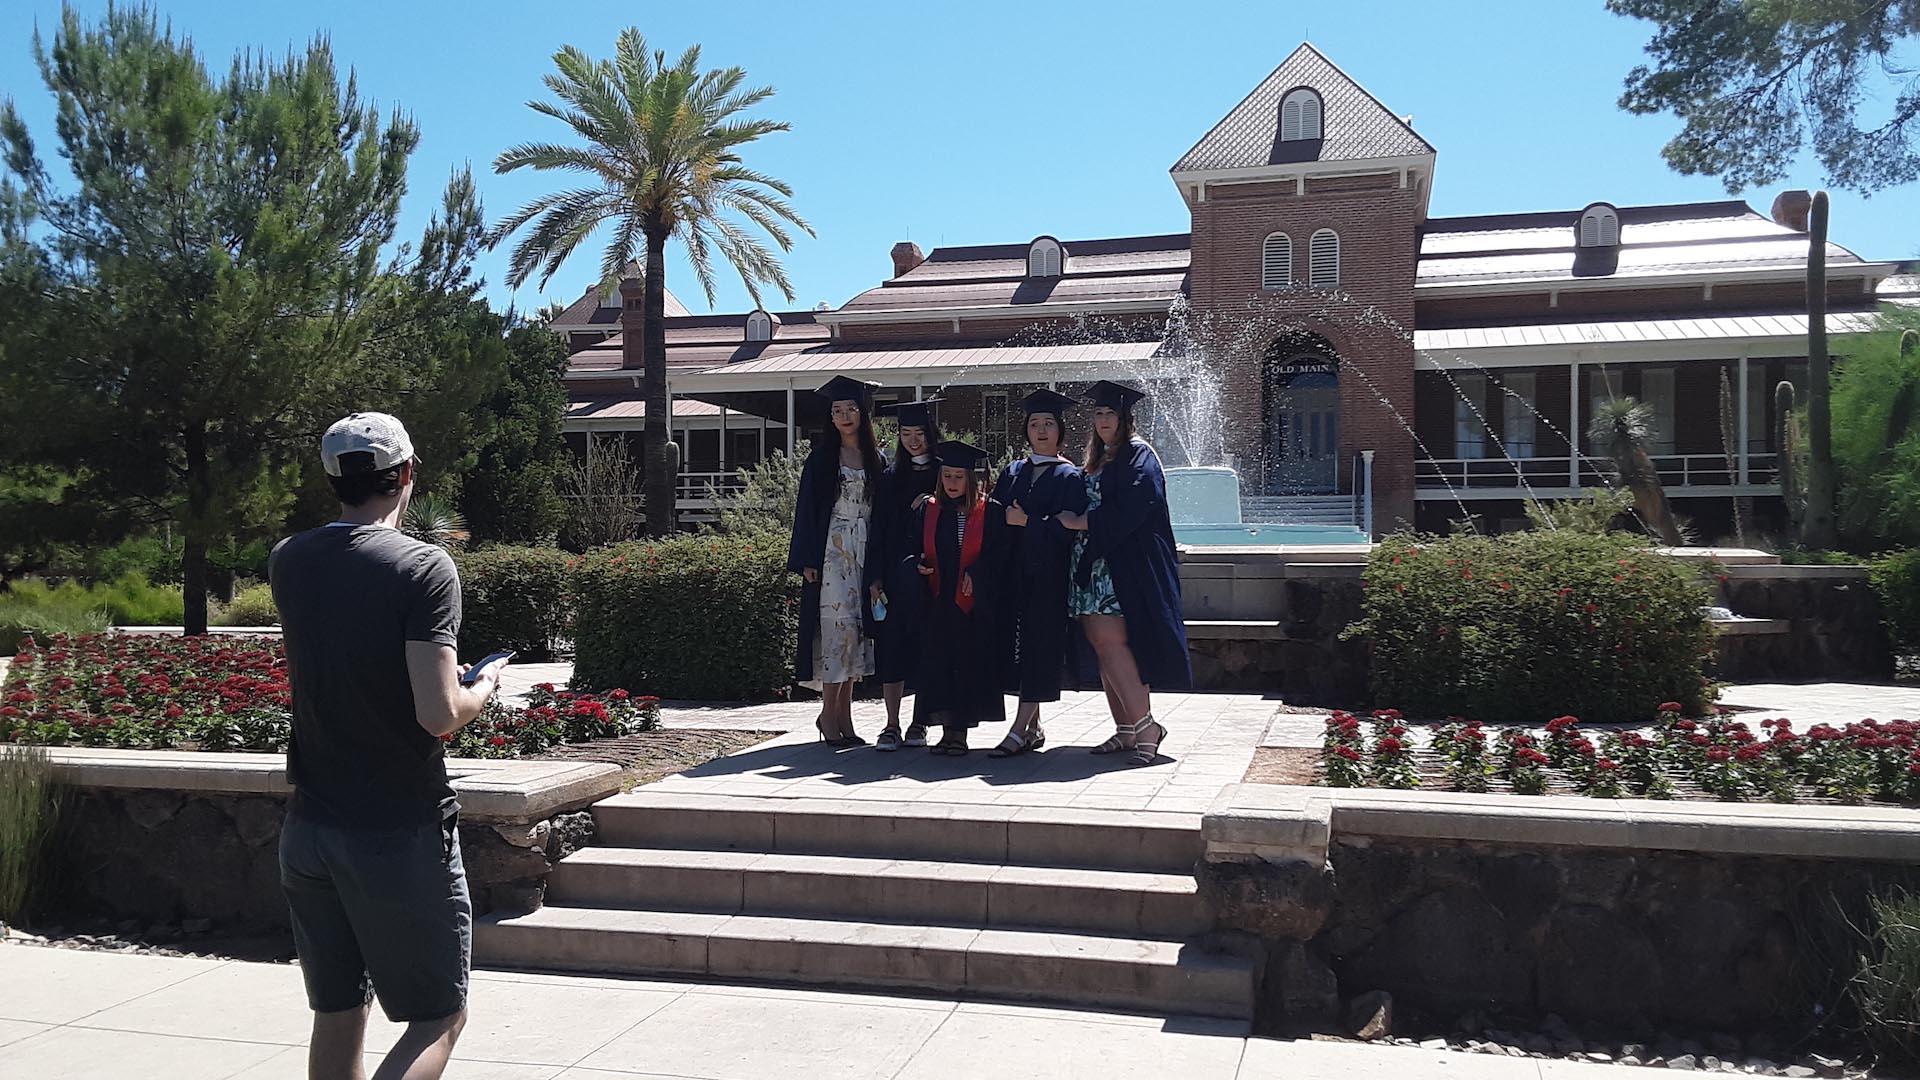 Spring 2020 University of Arizona graduates pose for photos at Old Main.